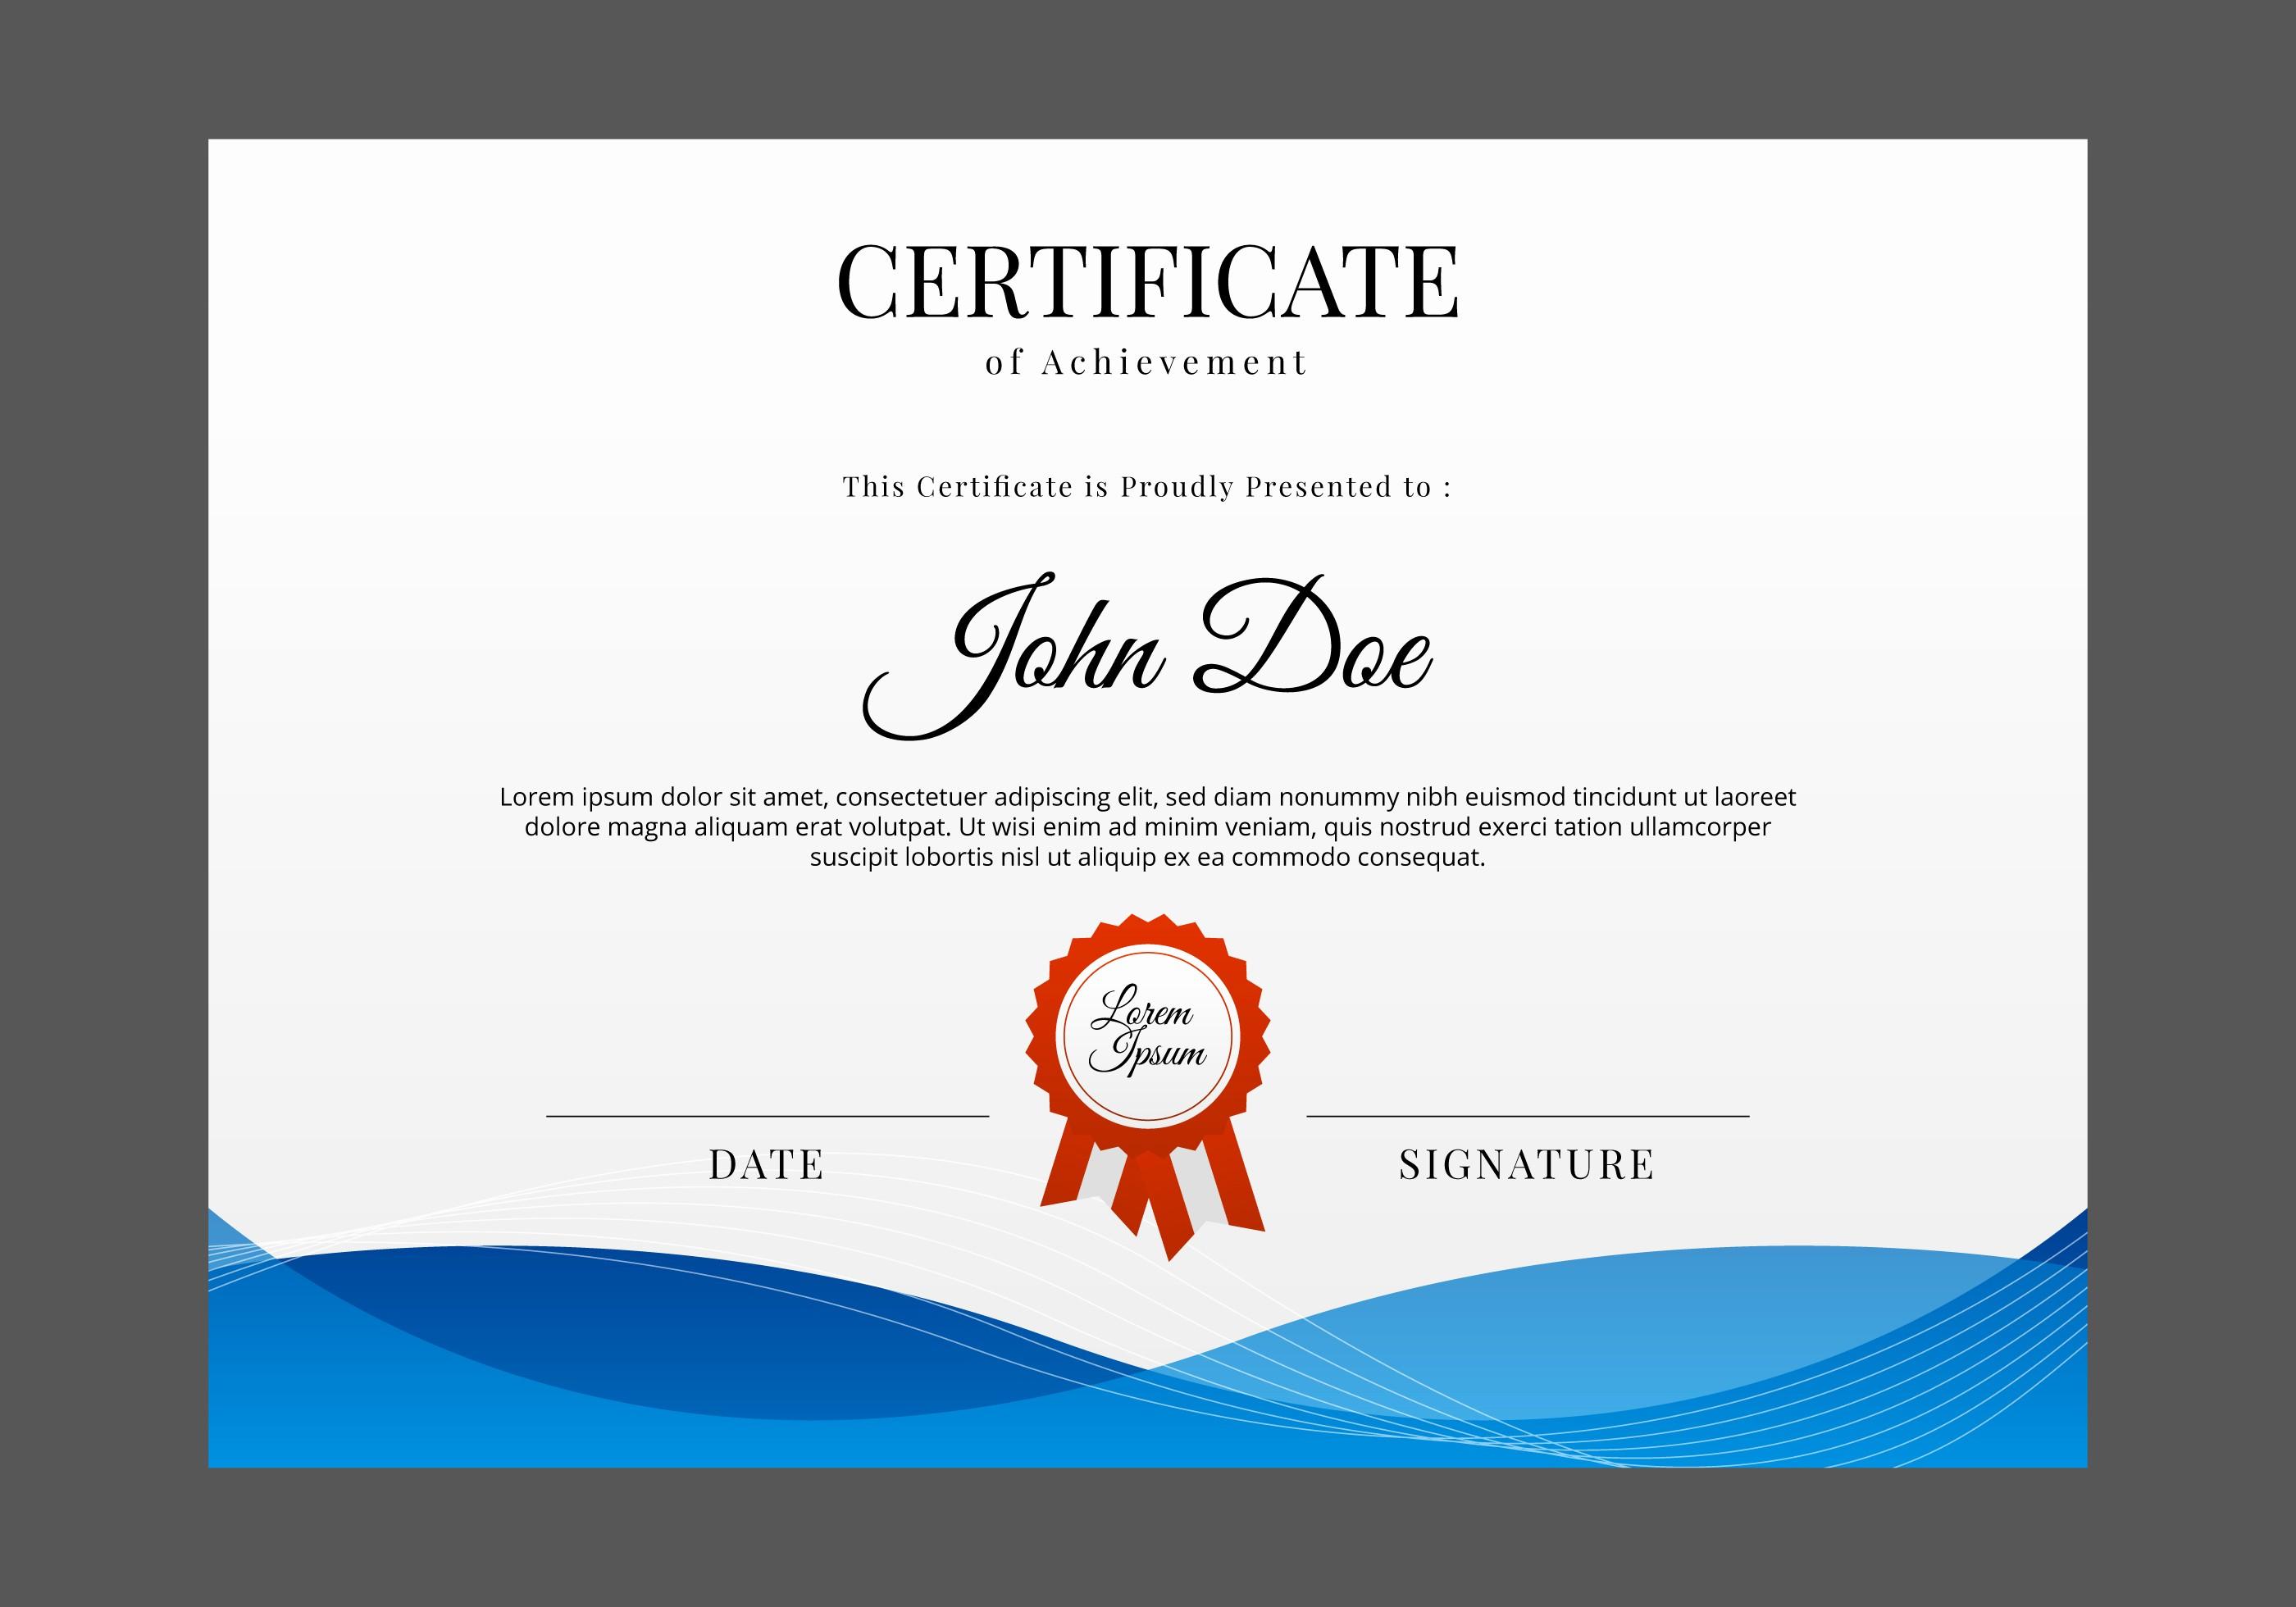 Free Printable Graduation Certificate Templates Awesome Free Certificate Template Vector Download Free Vector